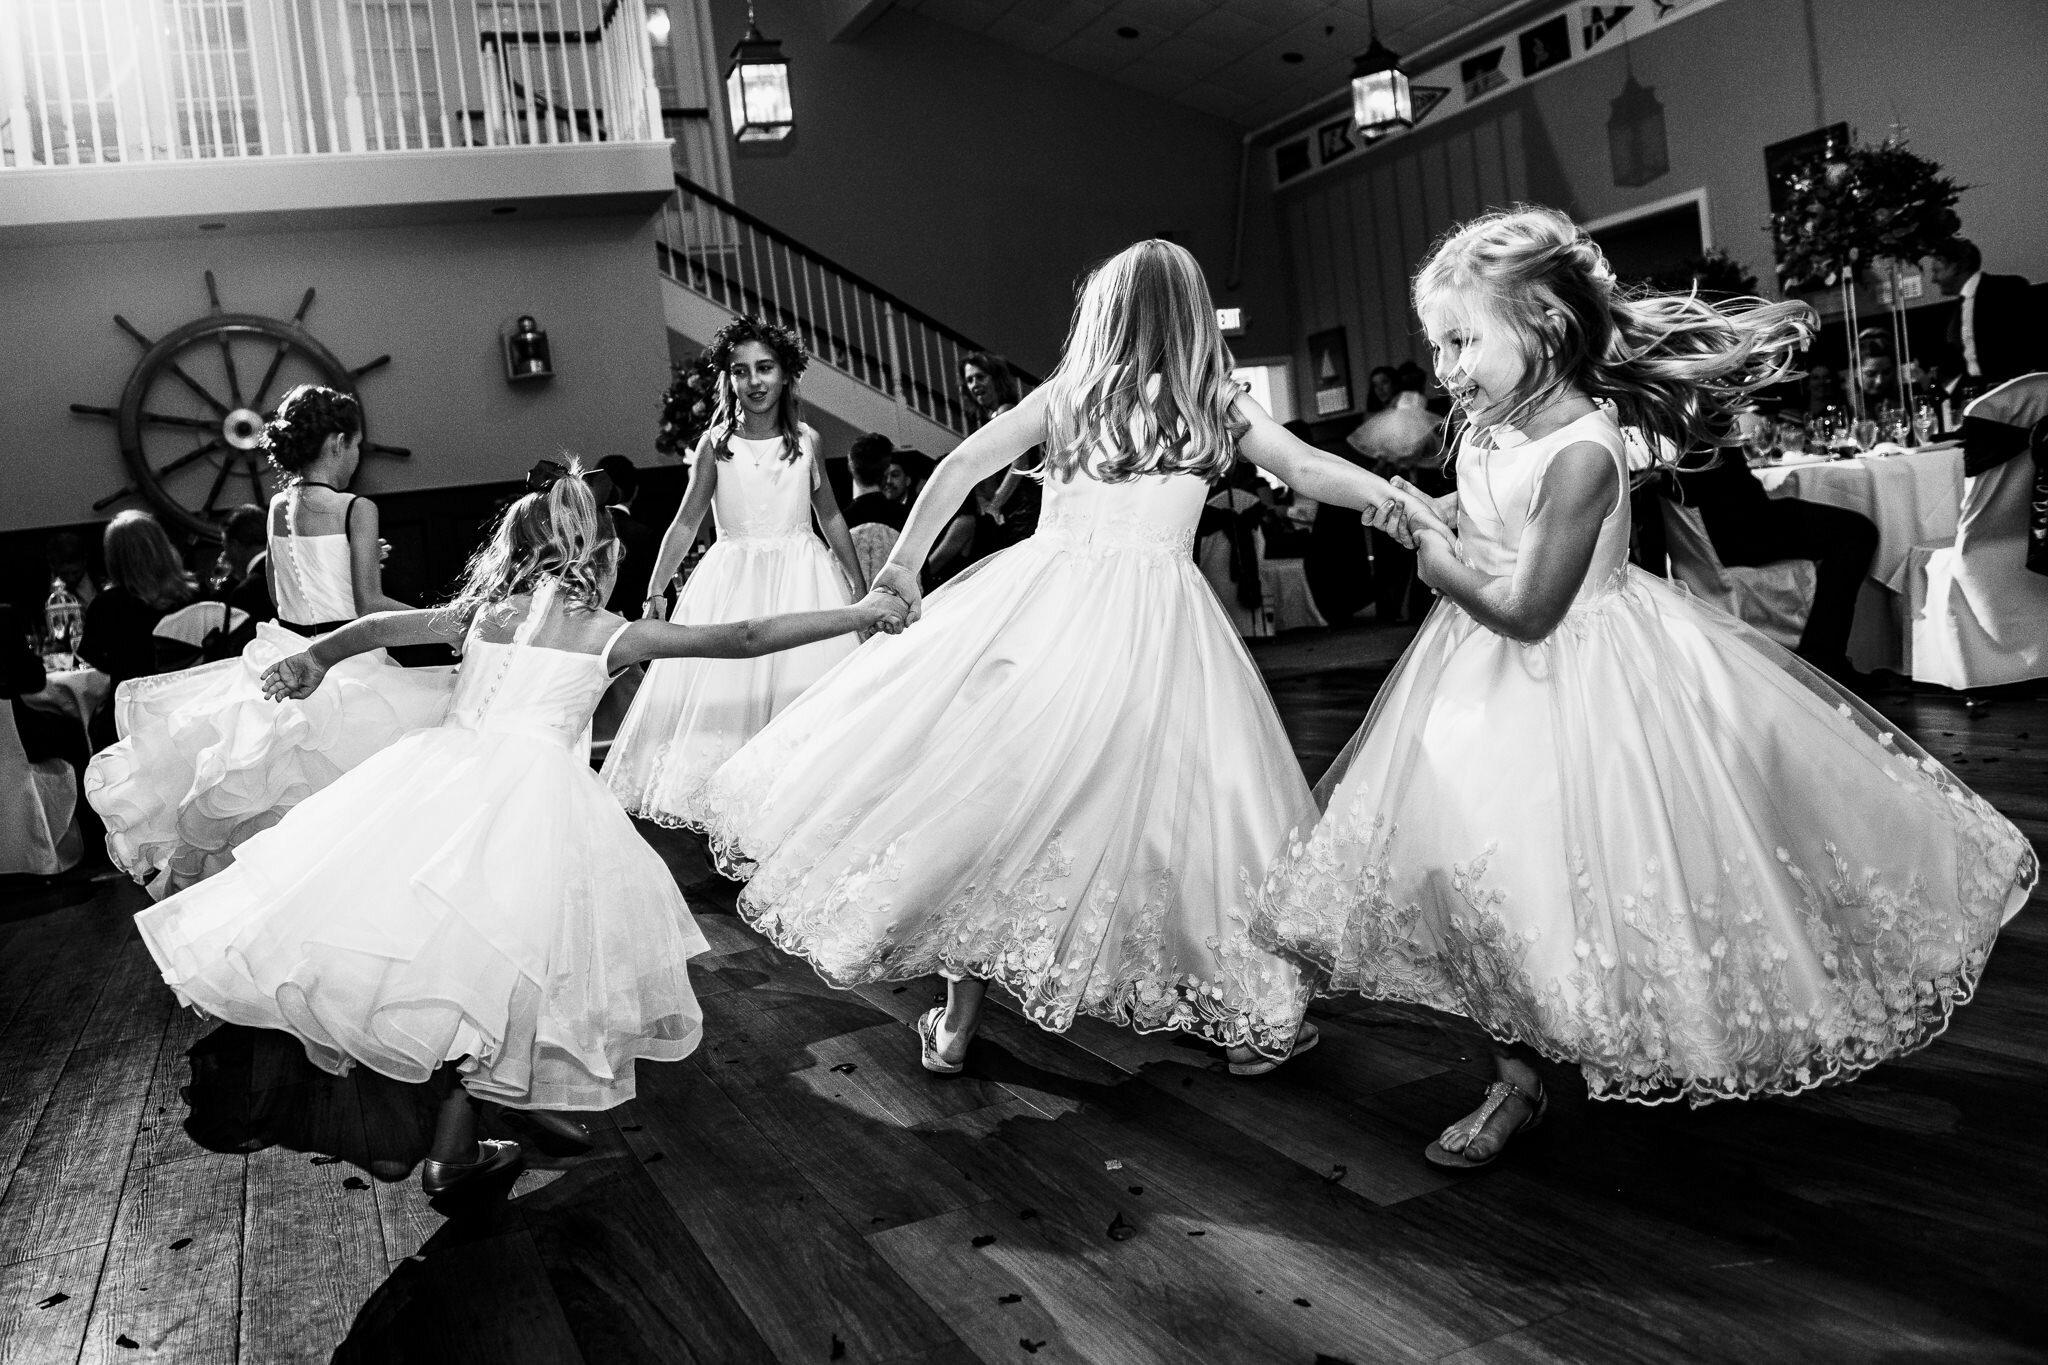 Snell-Ocean-City-Yacht-Club-New-Jersey-Wedding-Photographer-29.JPG